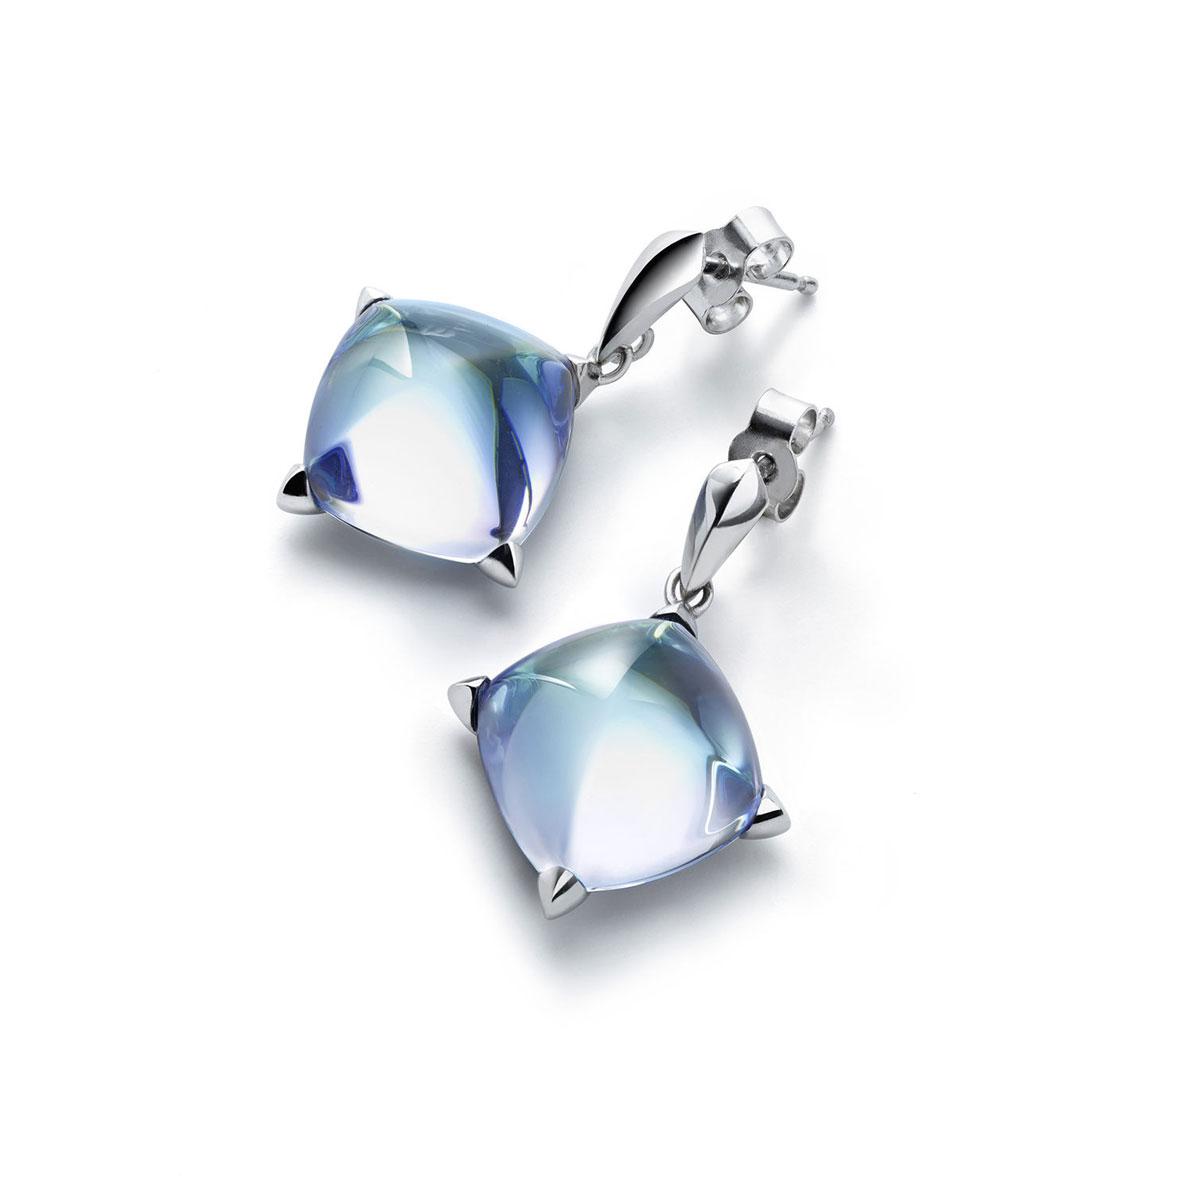 Baccarat Crystal Medicis Stem Earrings Sterling Silver Aqua